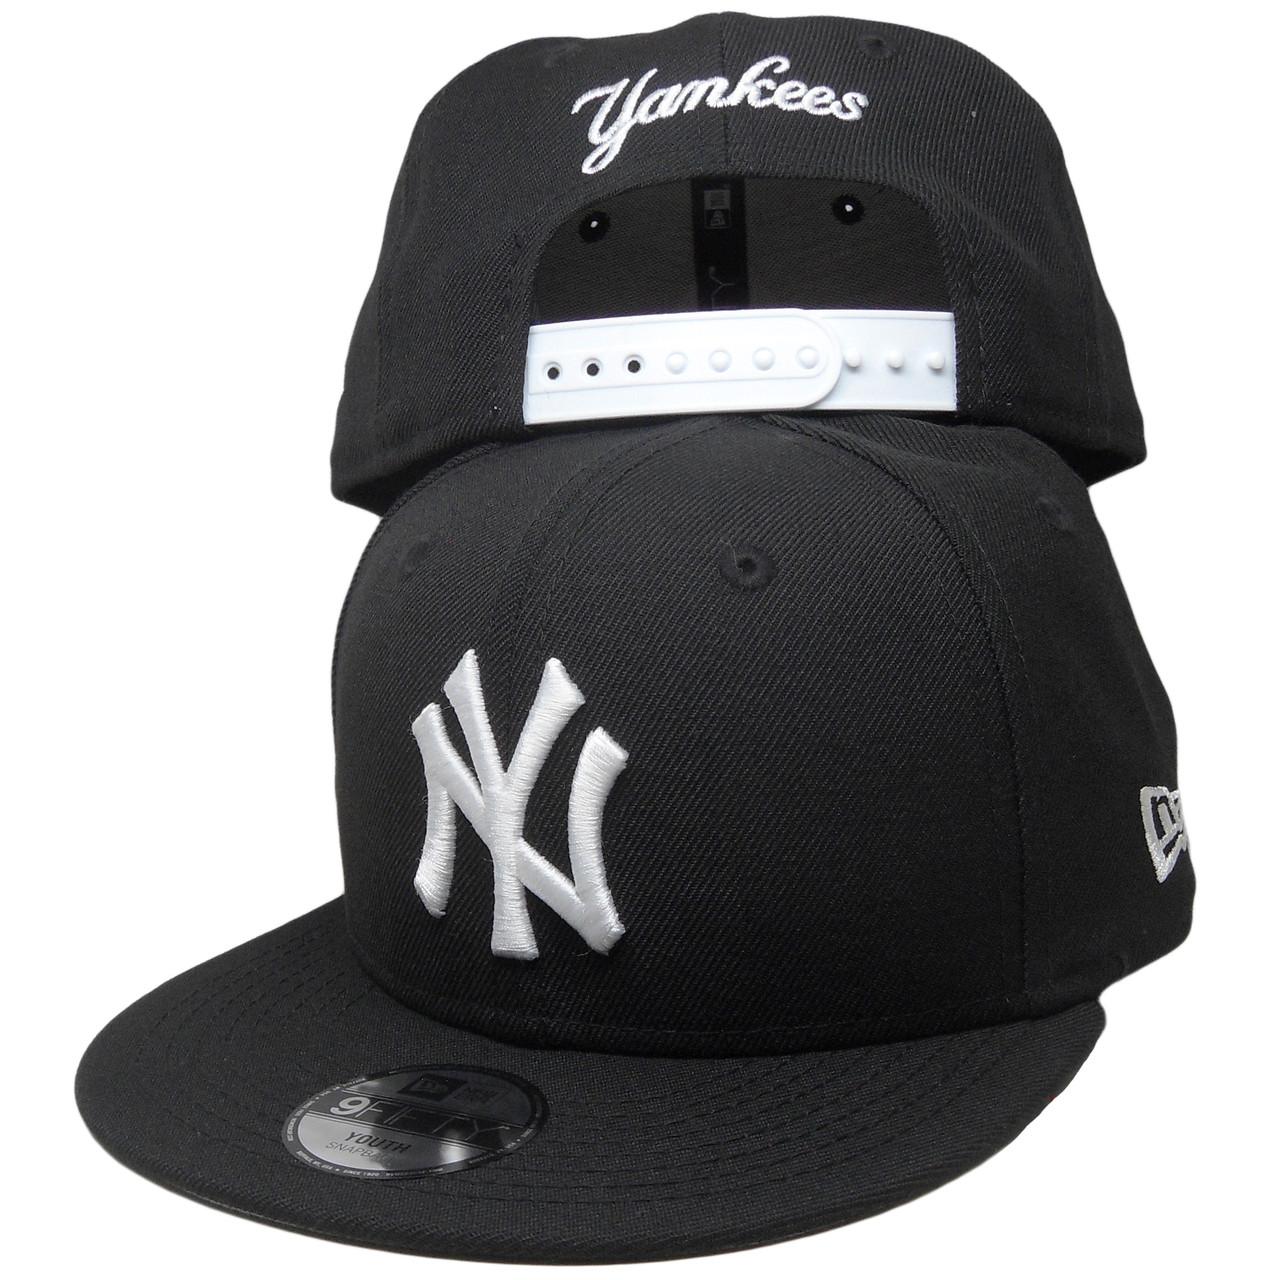 size 40 b8375 cf3db New York Yankees New Era Custom KIDS 9Fifty Snapback - Black, White -  ECapsUnlimited.com